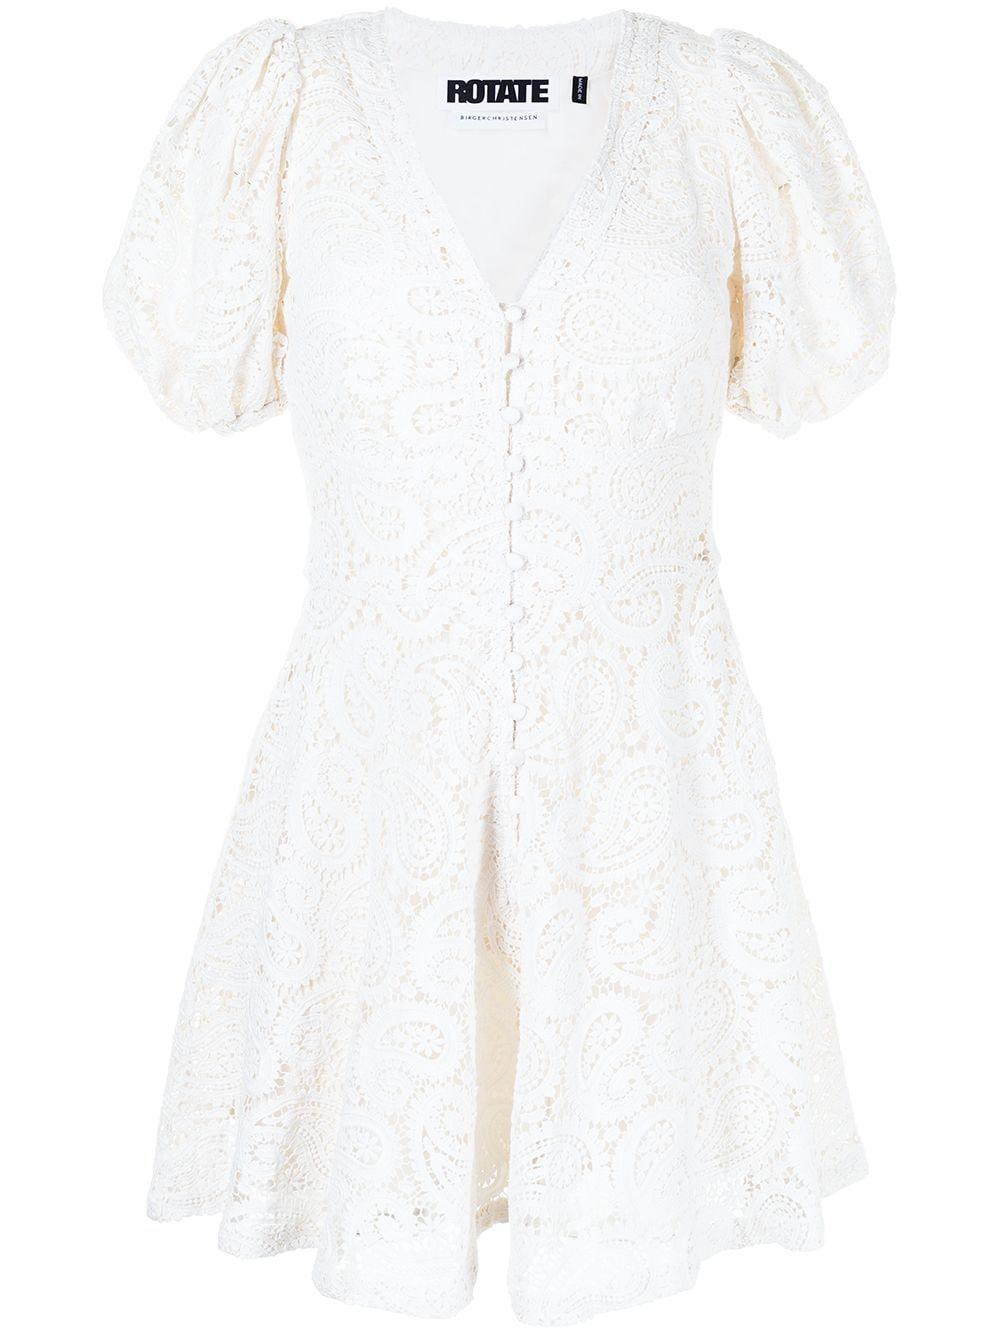 Deanna Dress Item # RT231-S21